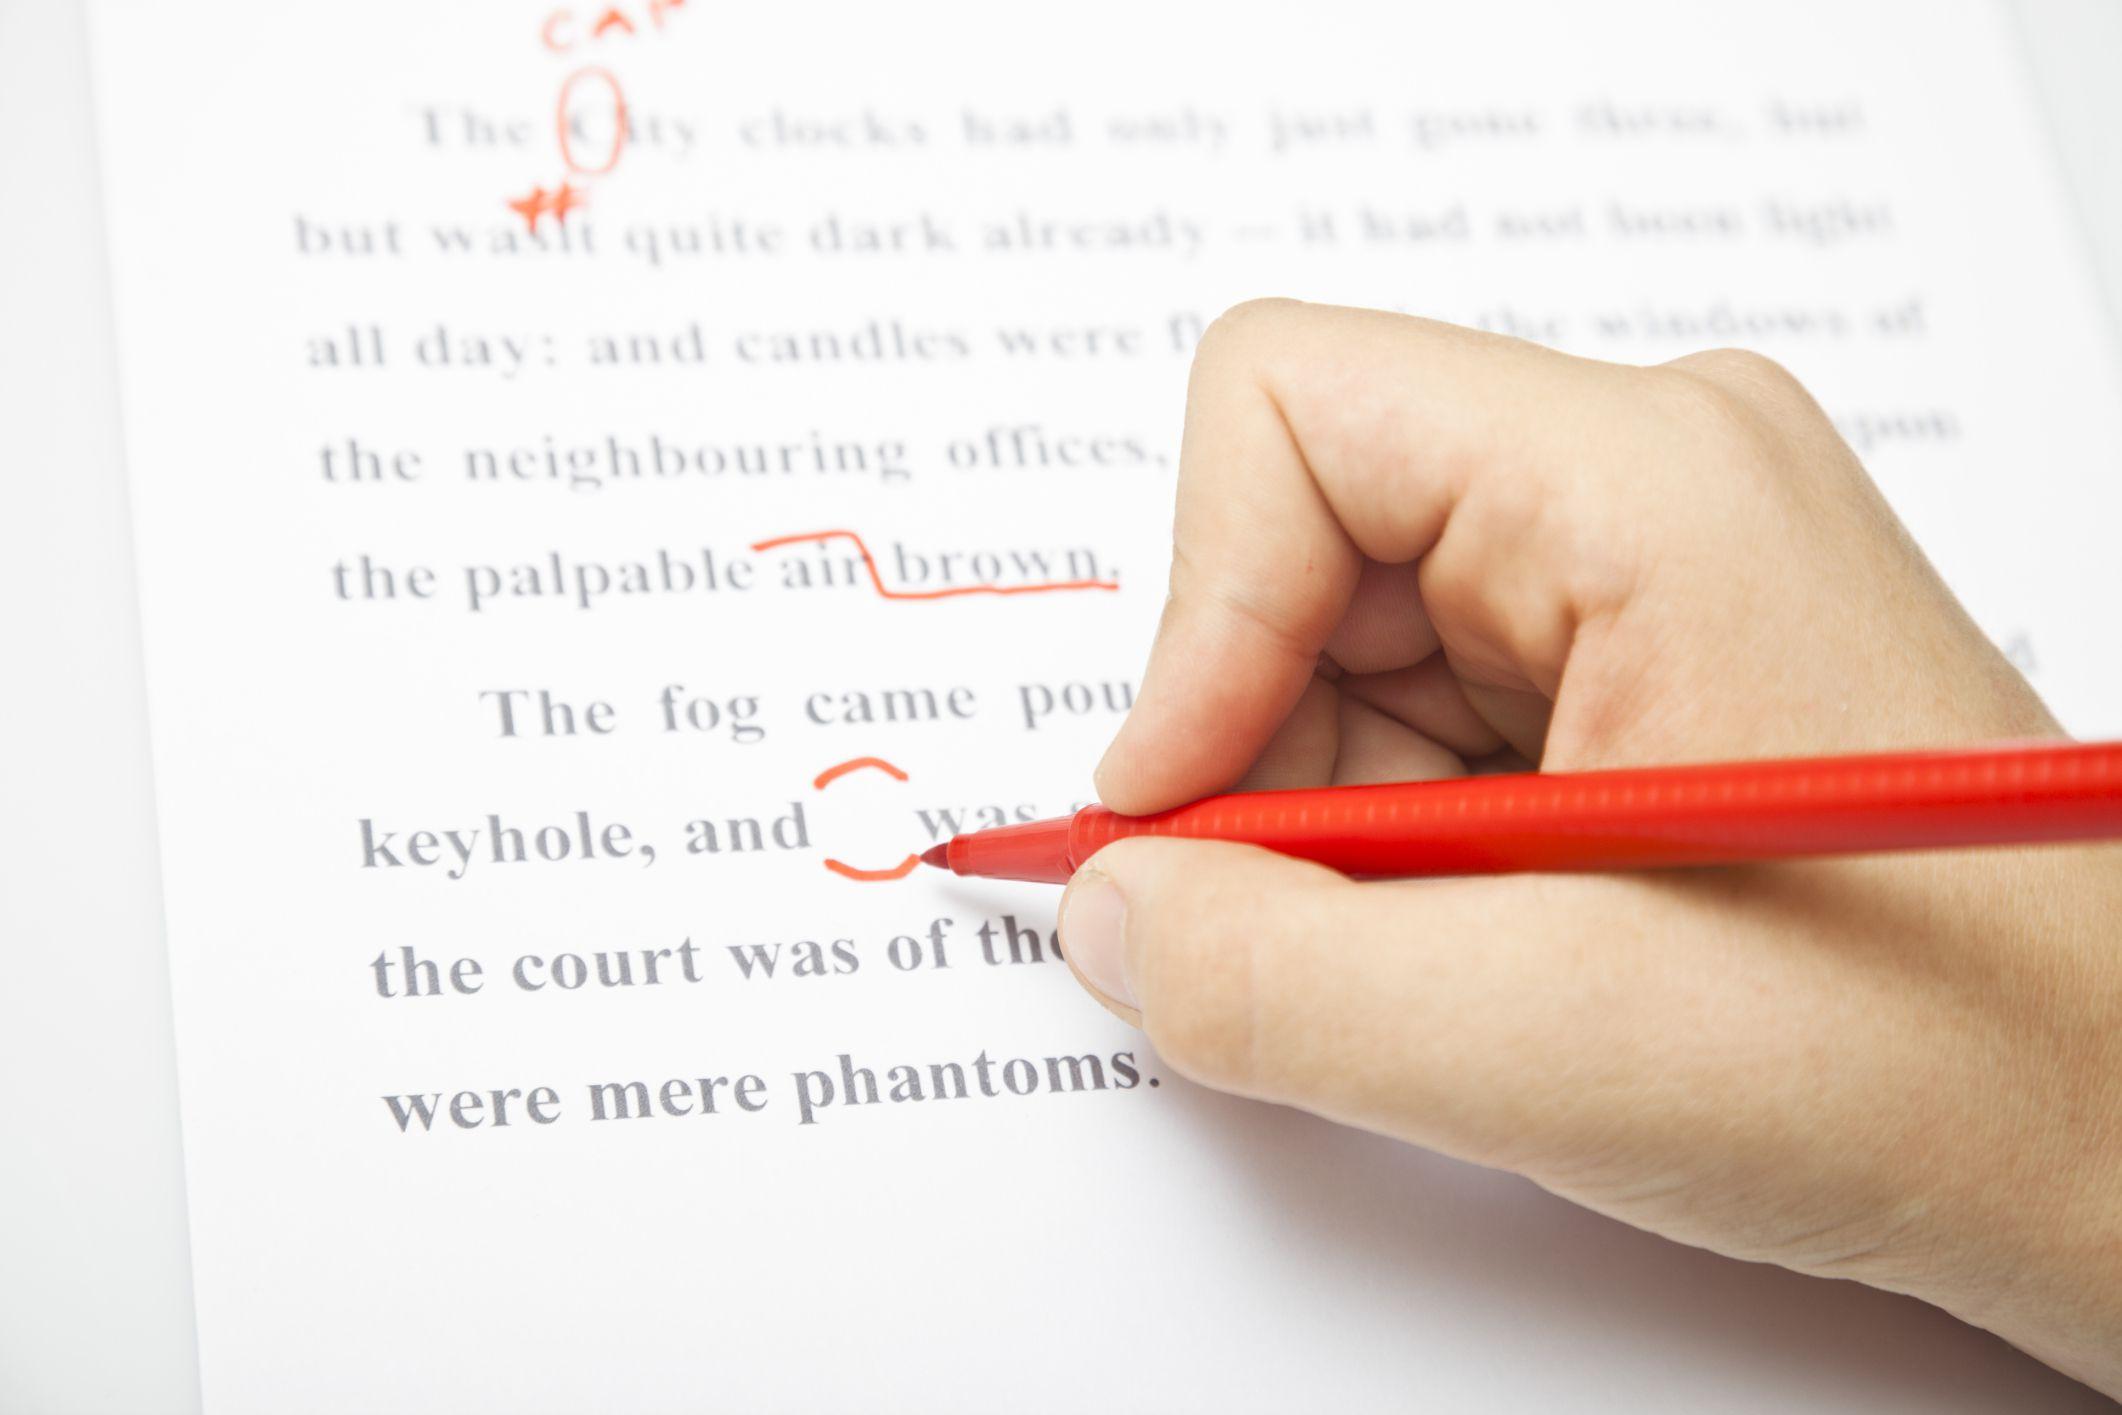 Report writing skills image 1